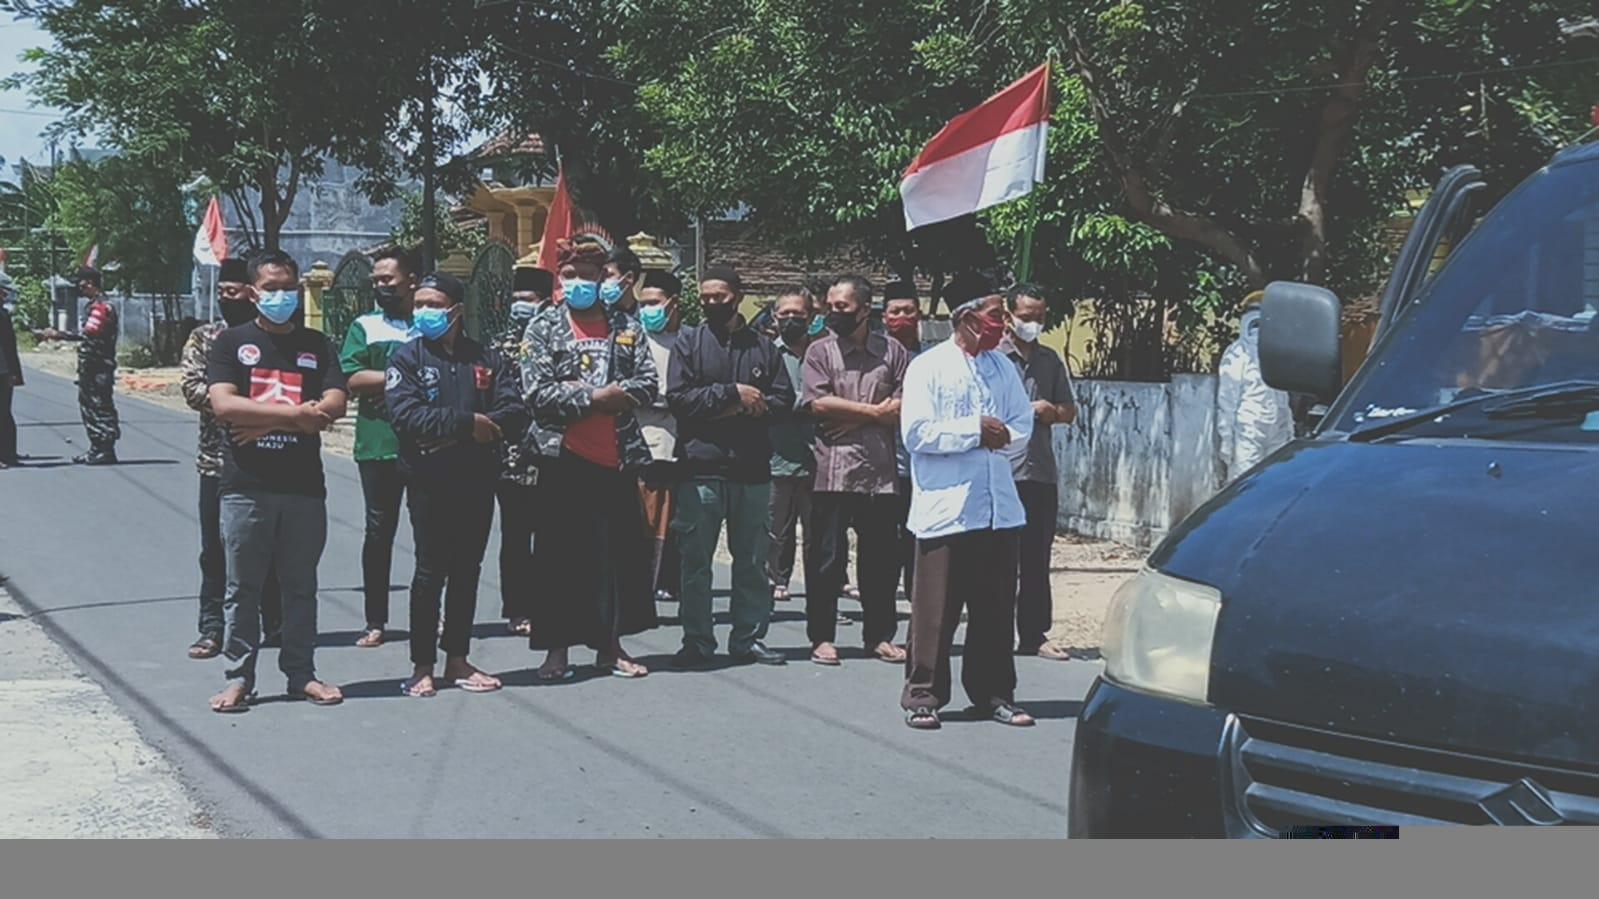 Para aktivis GP Ansor Babadan serta relawan LPBI NU Ponorogo menjadi ma'mum salat jenazah almarhum Mahmudin Asrofi. Tampak anggota Banser mengamankan alur lalu lintas